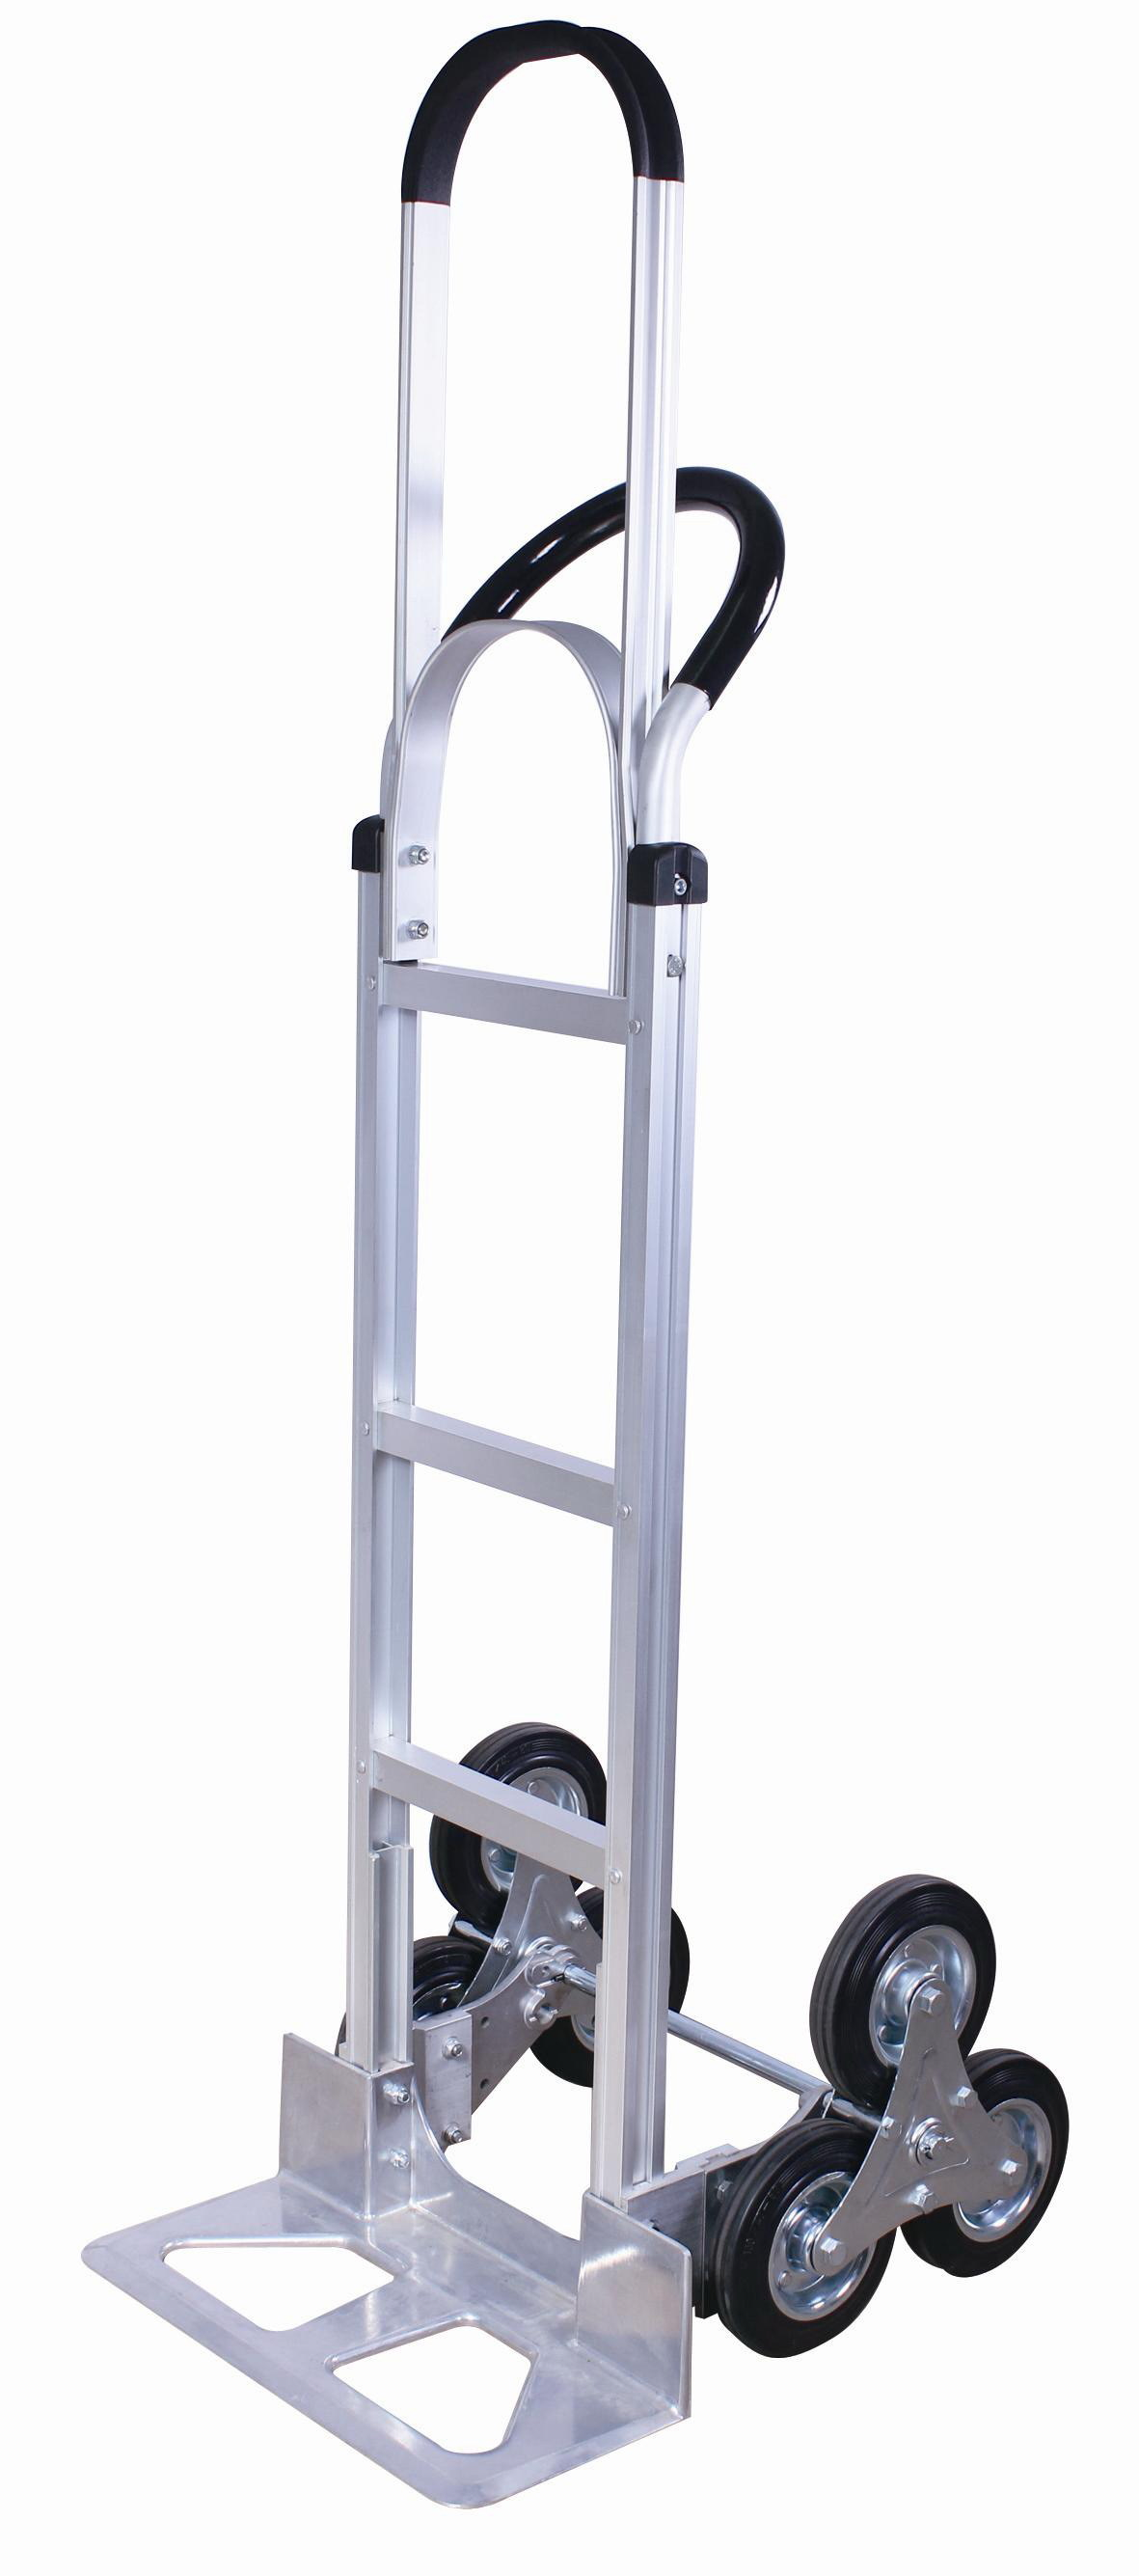 Tyke Supply Aluminum Stair Climber Hand Truck